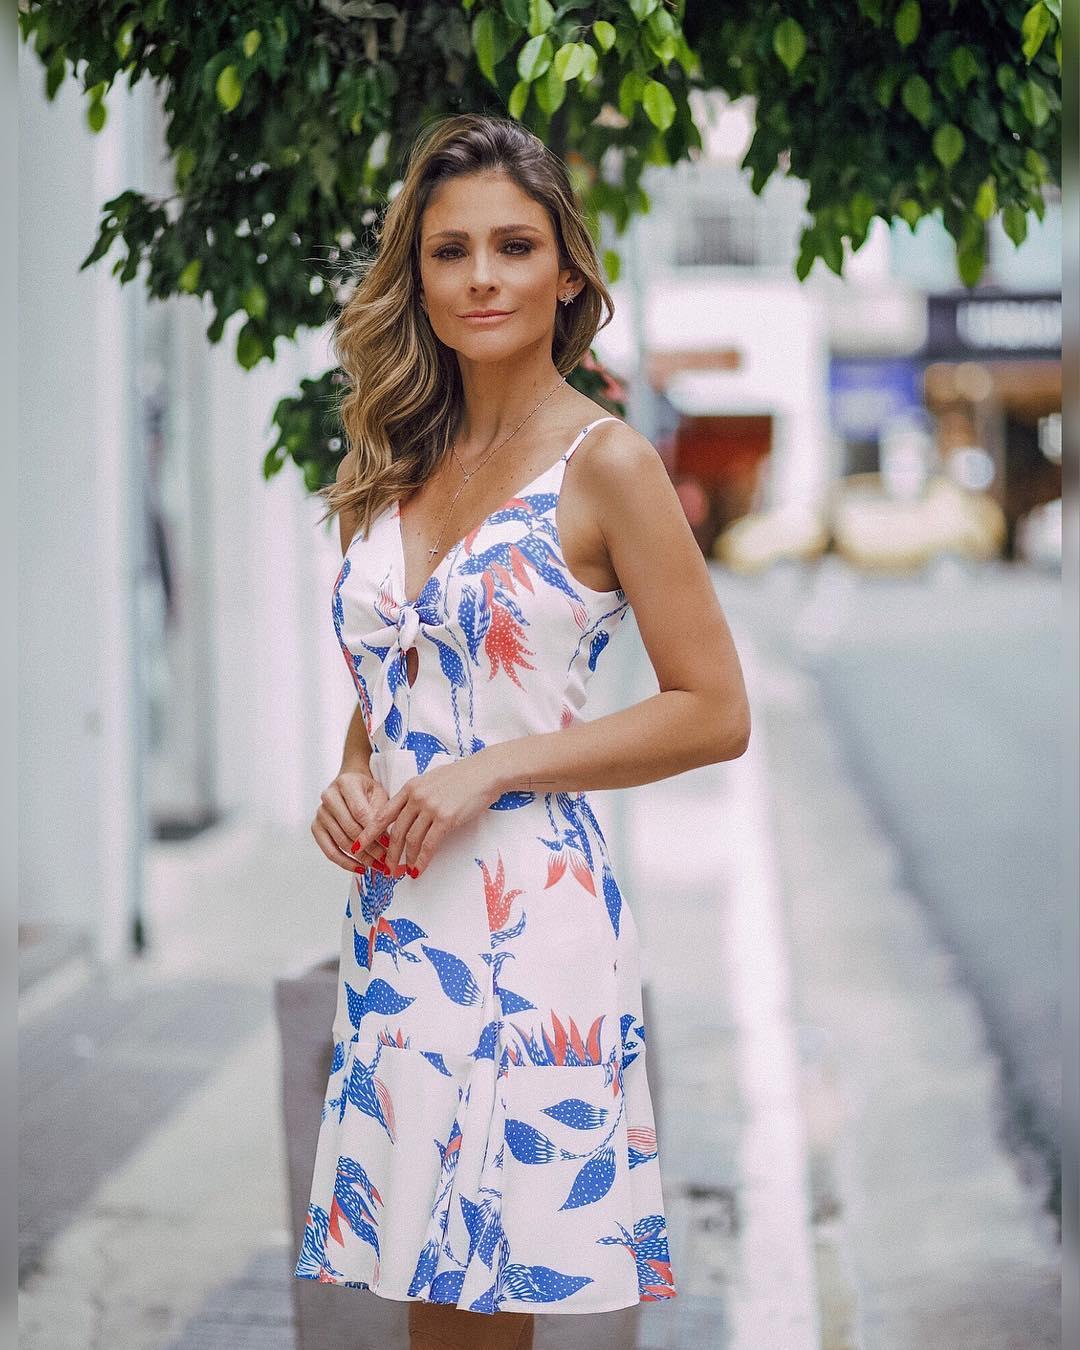 4844785ad Vestido Decote Laco Floral Donna Ritz | Loja de Roupas Femininas ...